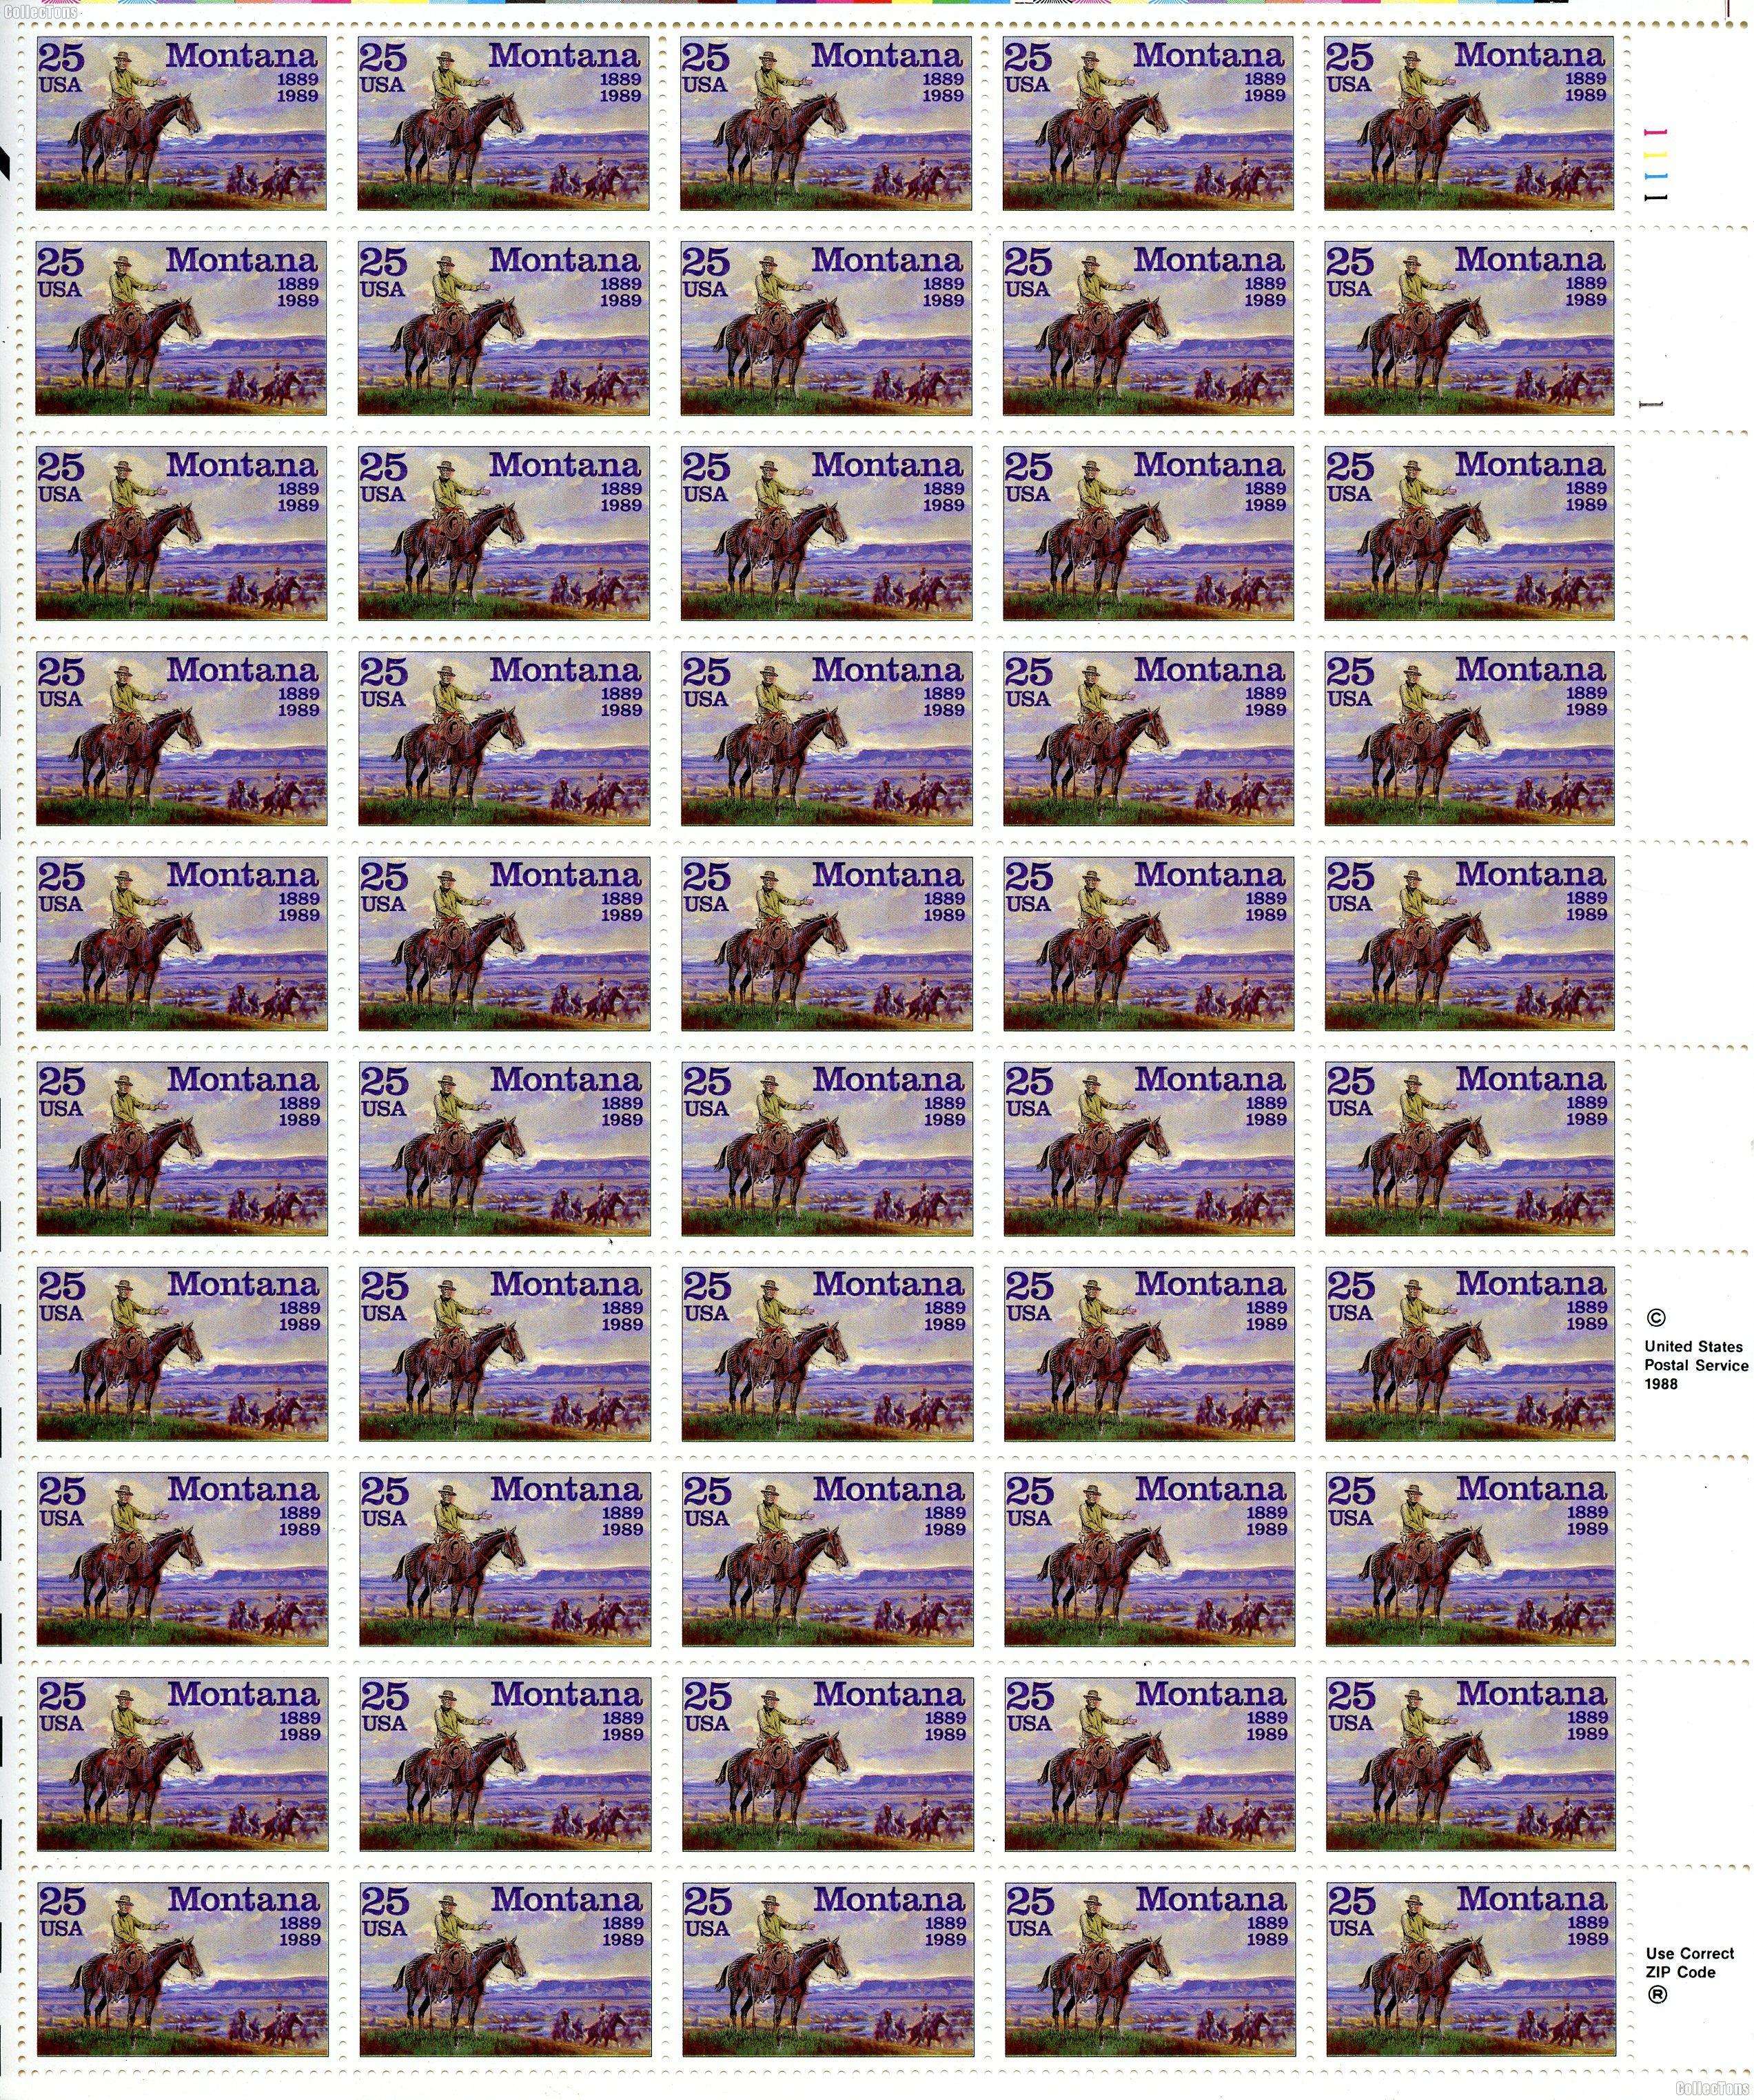 1989 Montana Statehood 25 Cent US Postage Stamp MNH Sheet of 50 Scott #2401